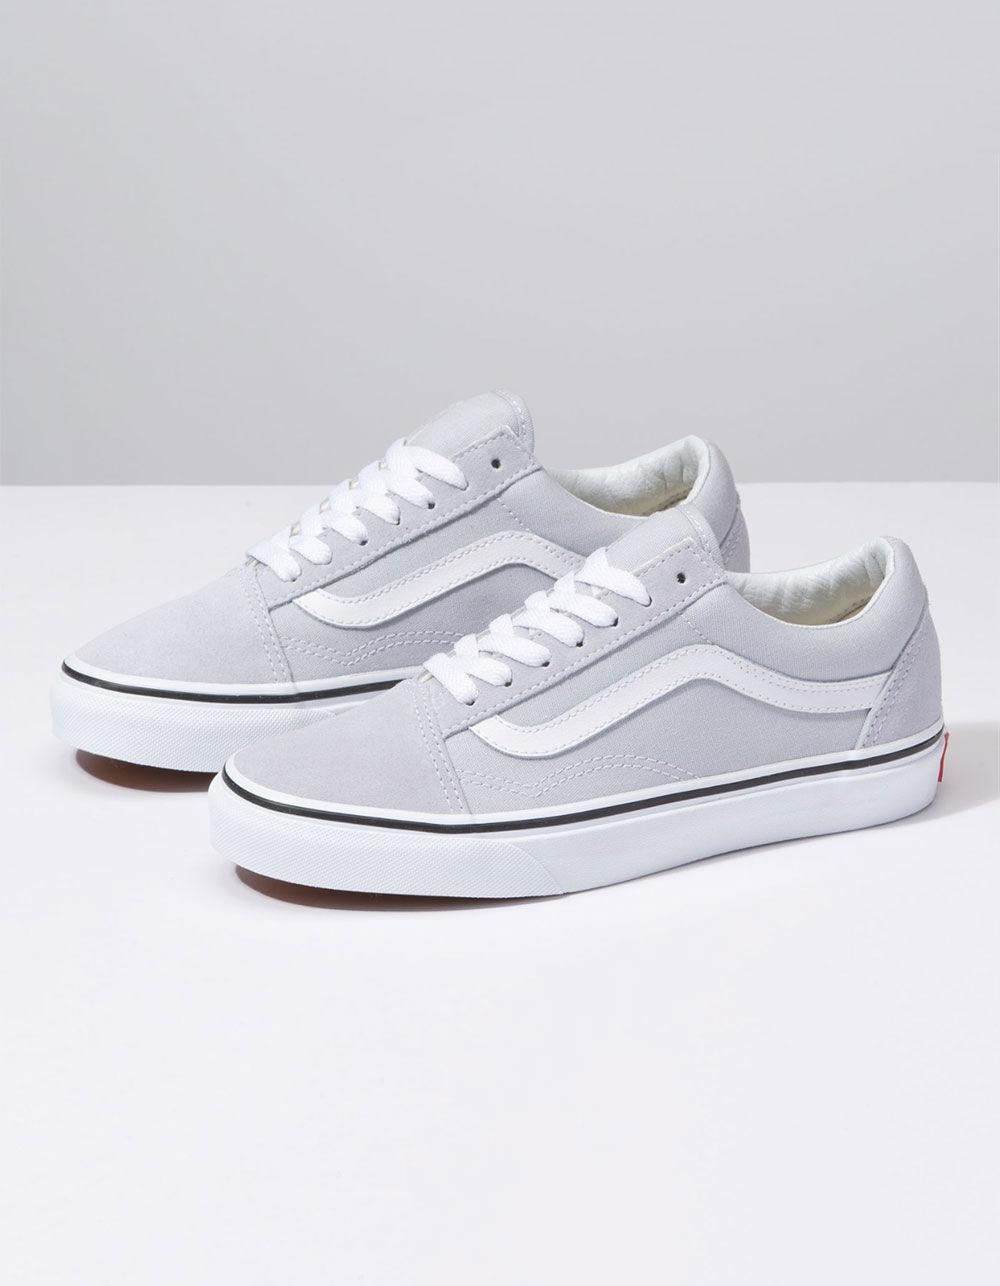 0bd0991d0982 Lyst - Vans Old Skool Gray Dawn   True White Womens Shoes in White